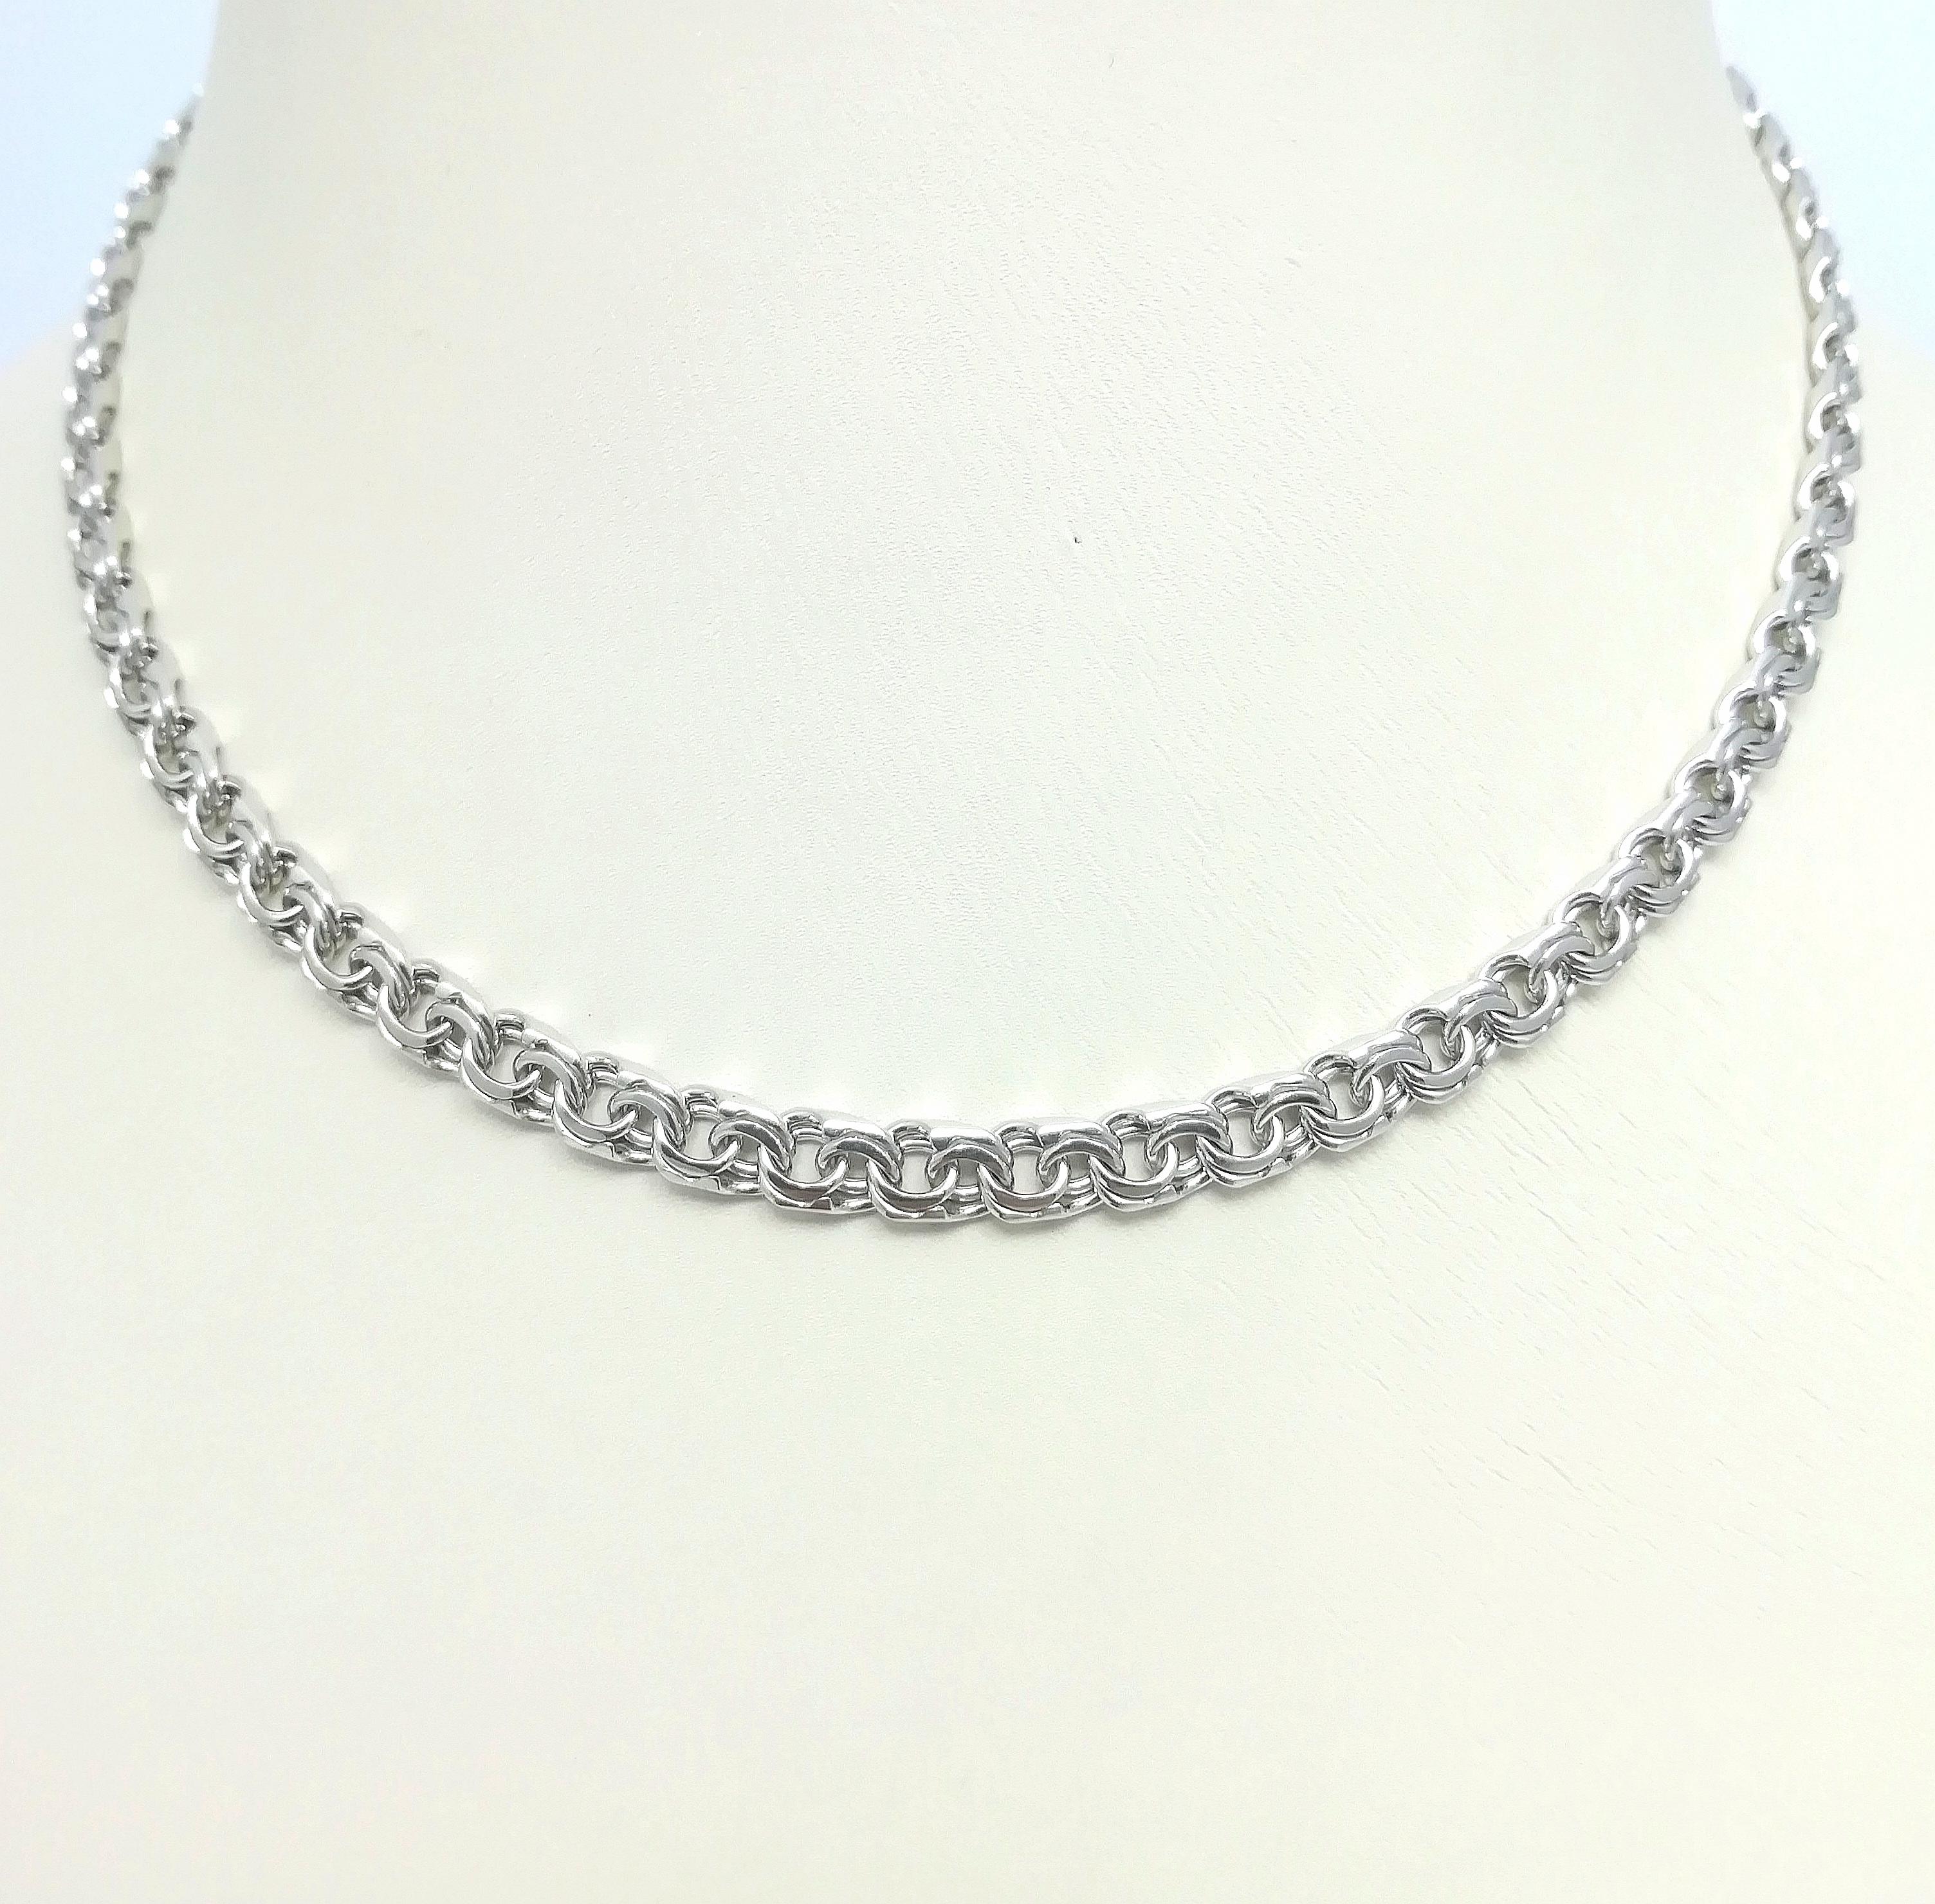 Серебро цепь дк240920-121 25,70гр